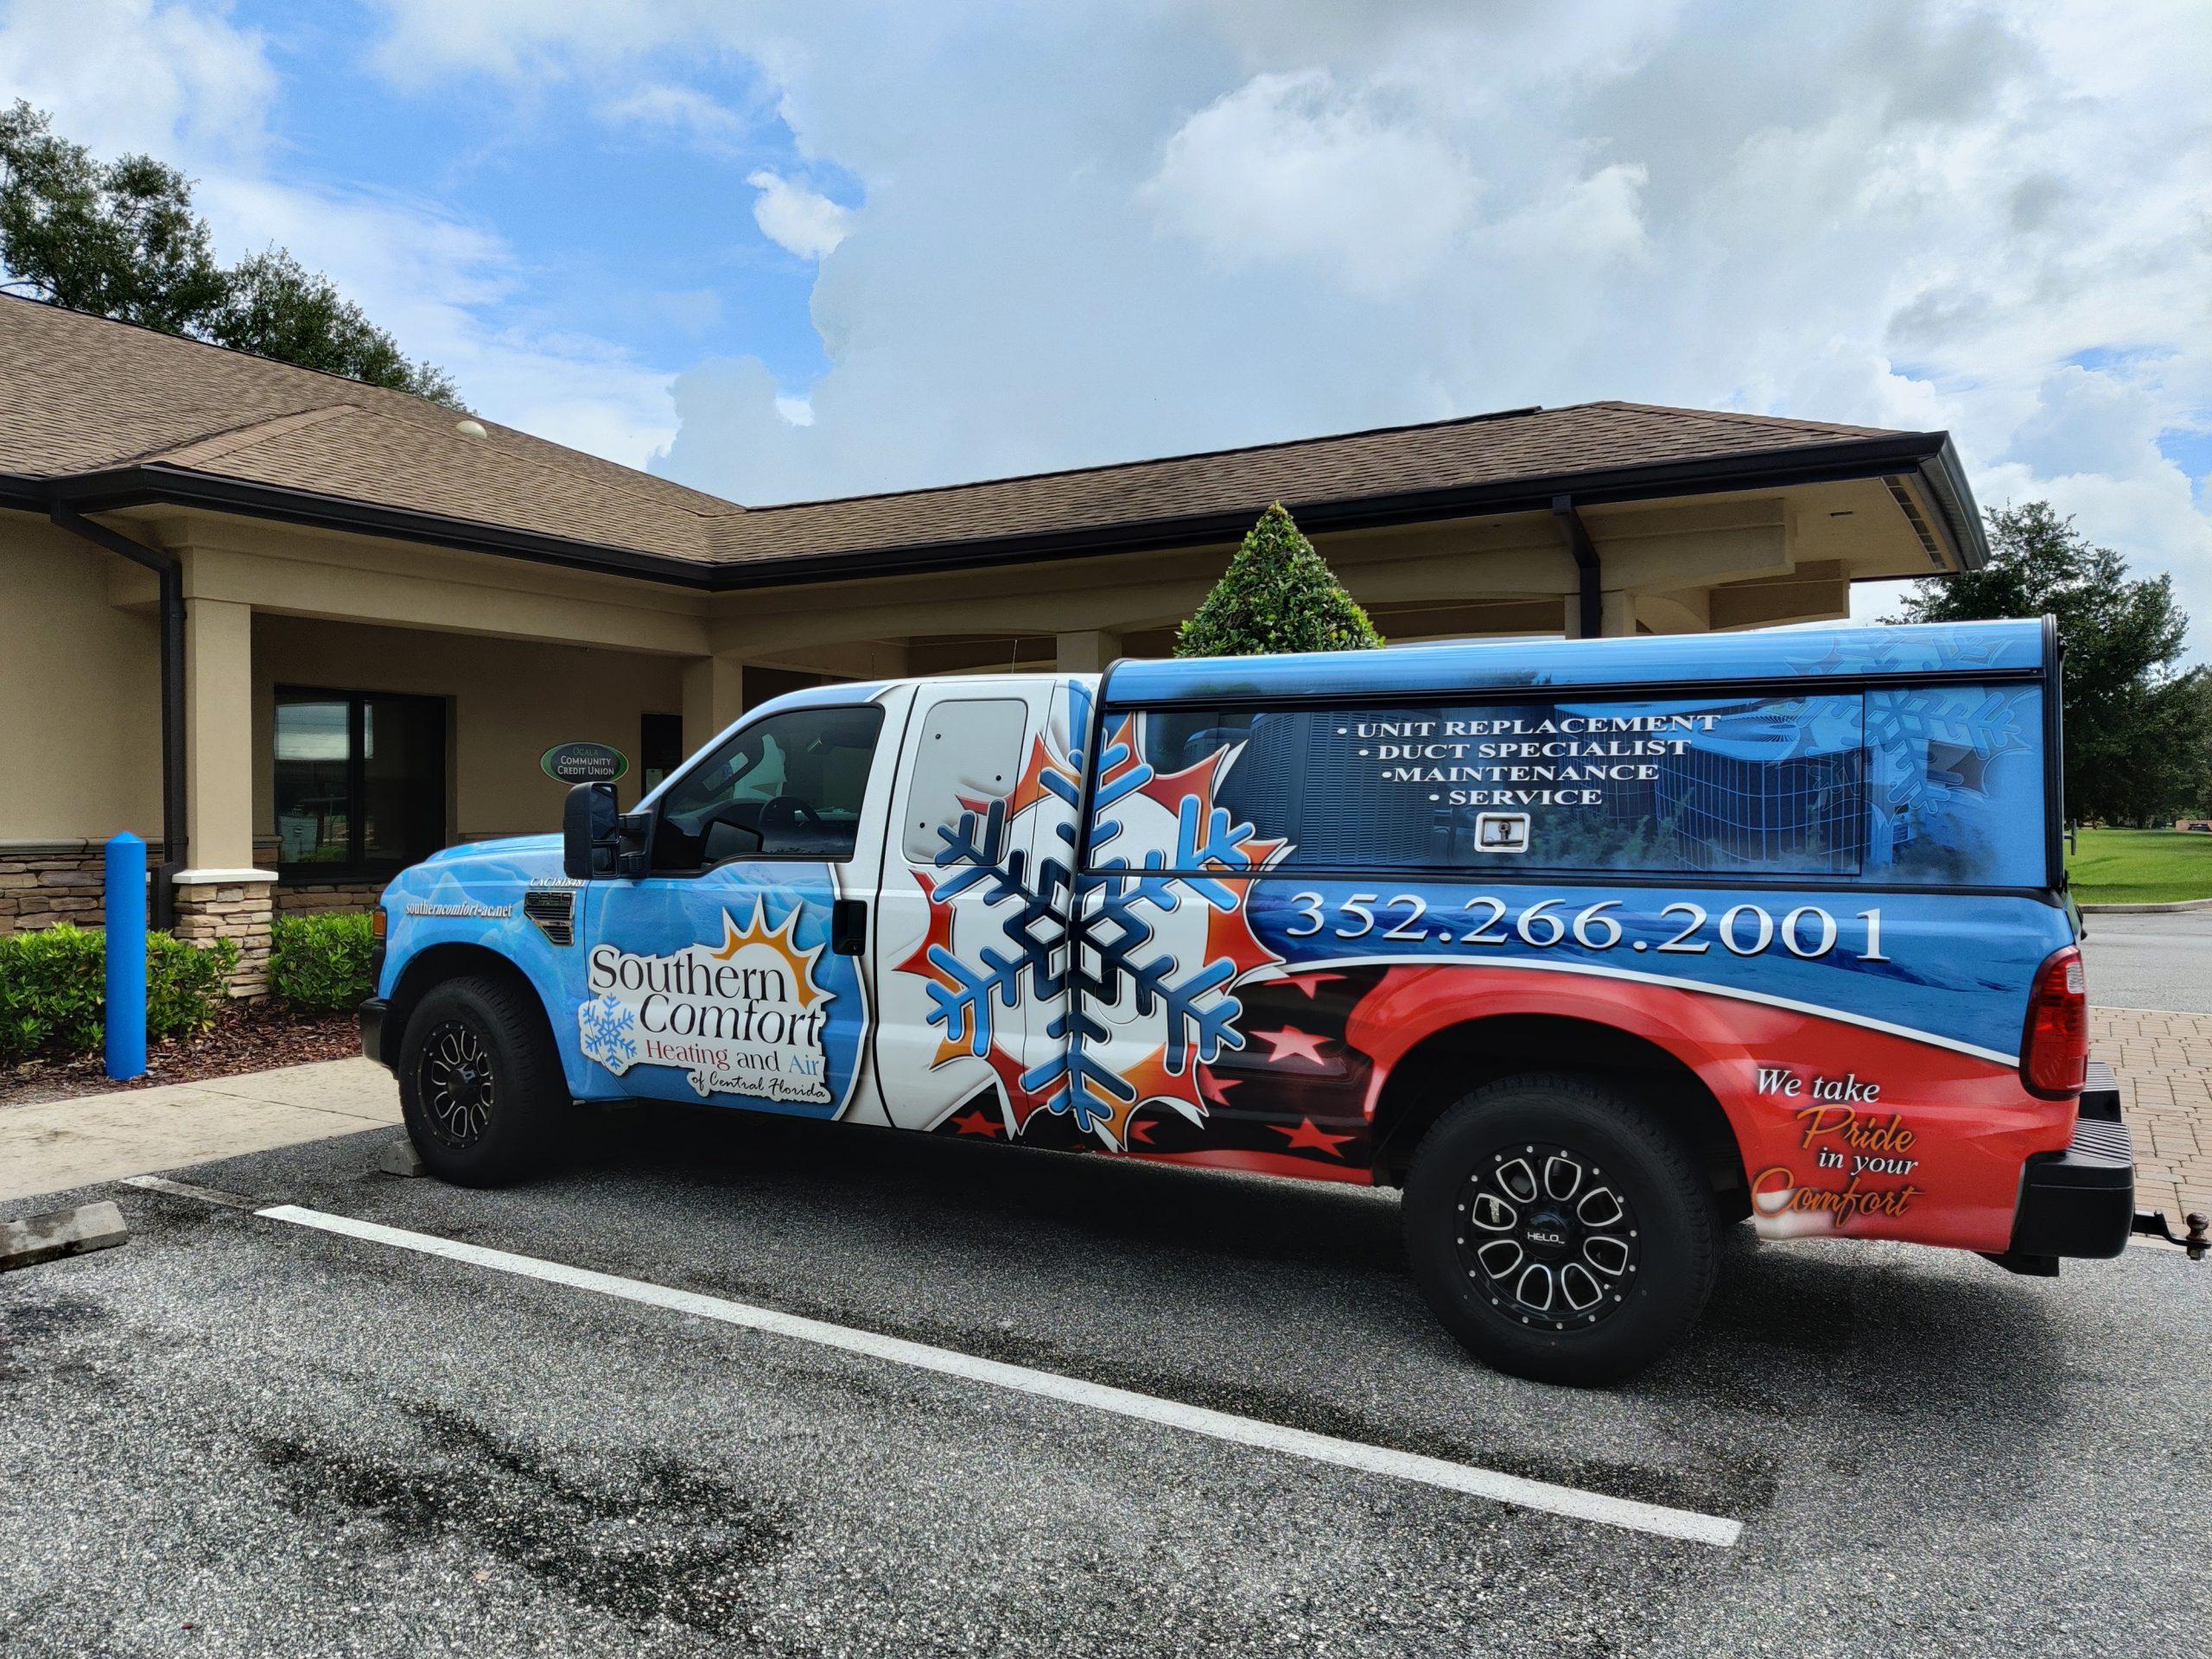 Southern Comfort HVAC Service